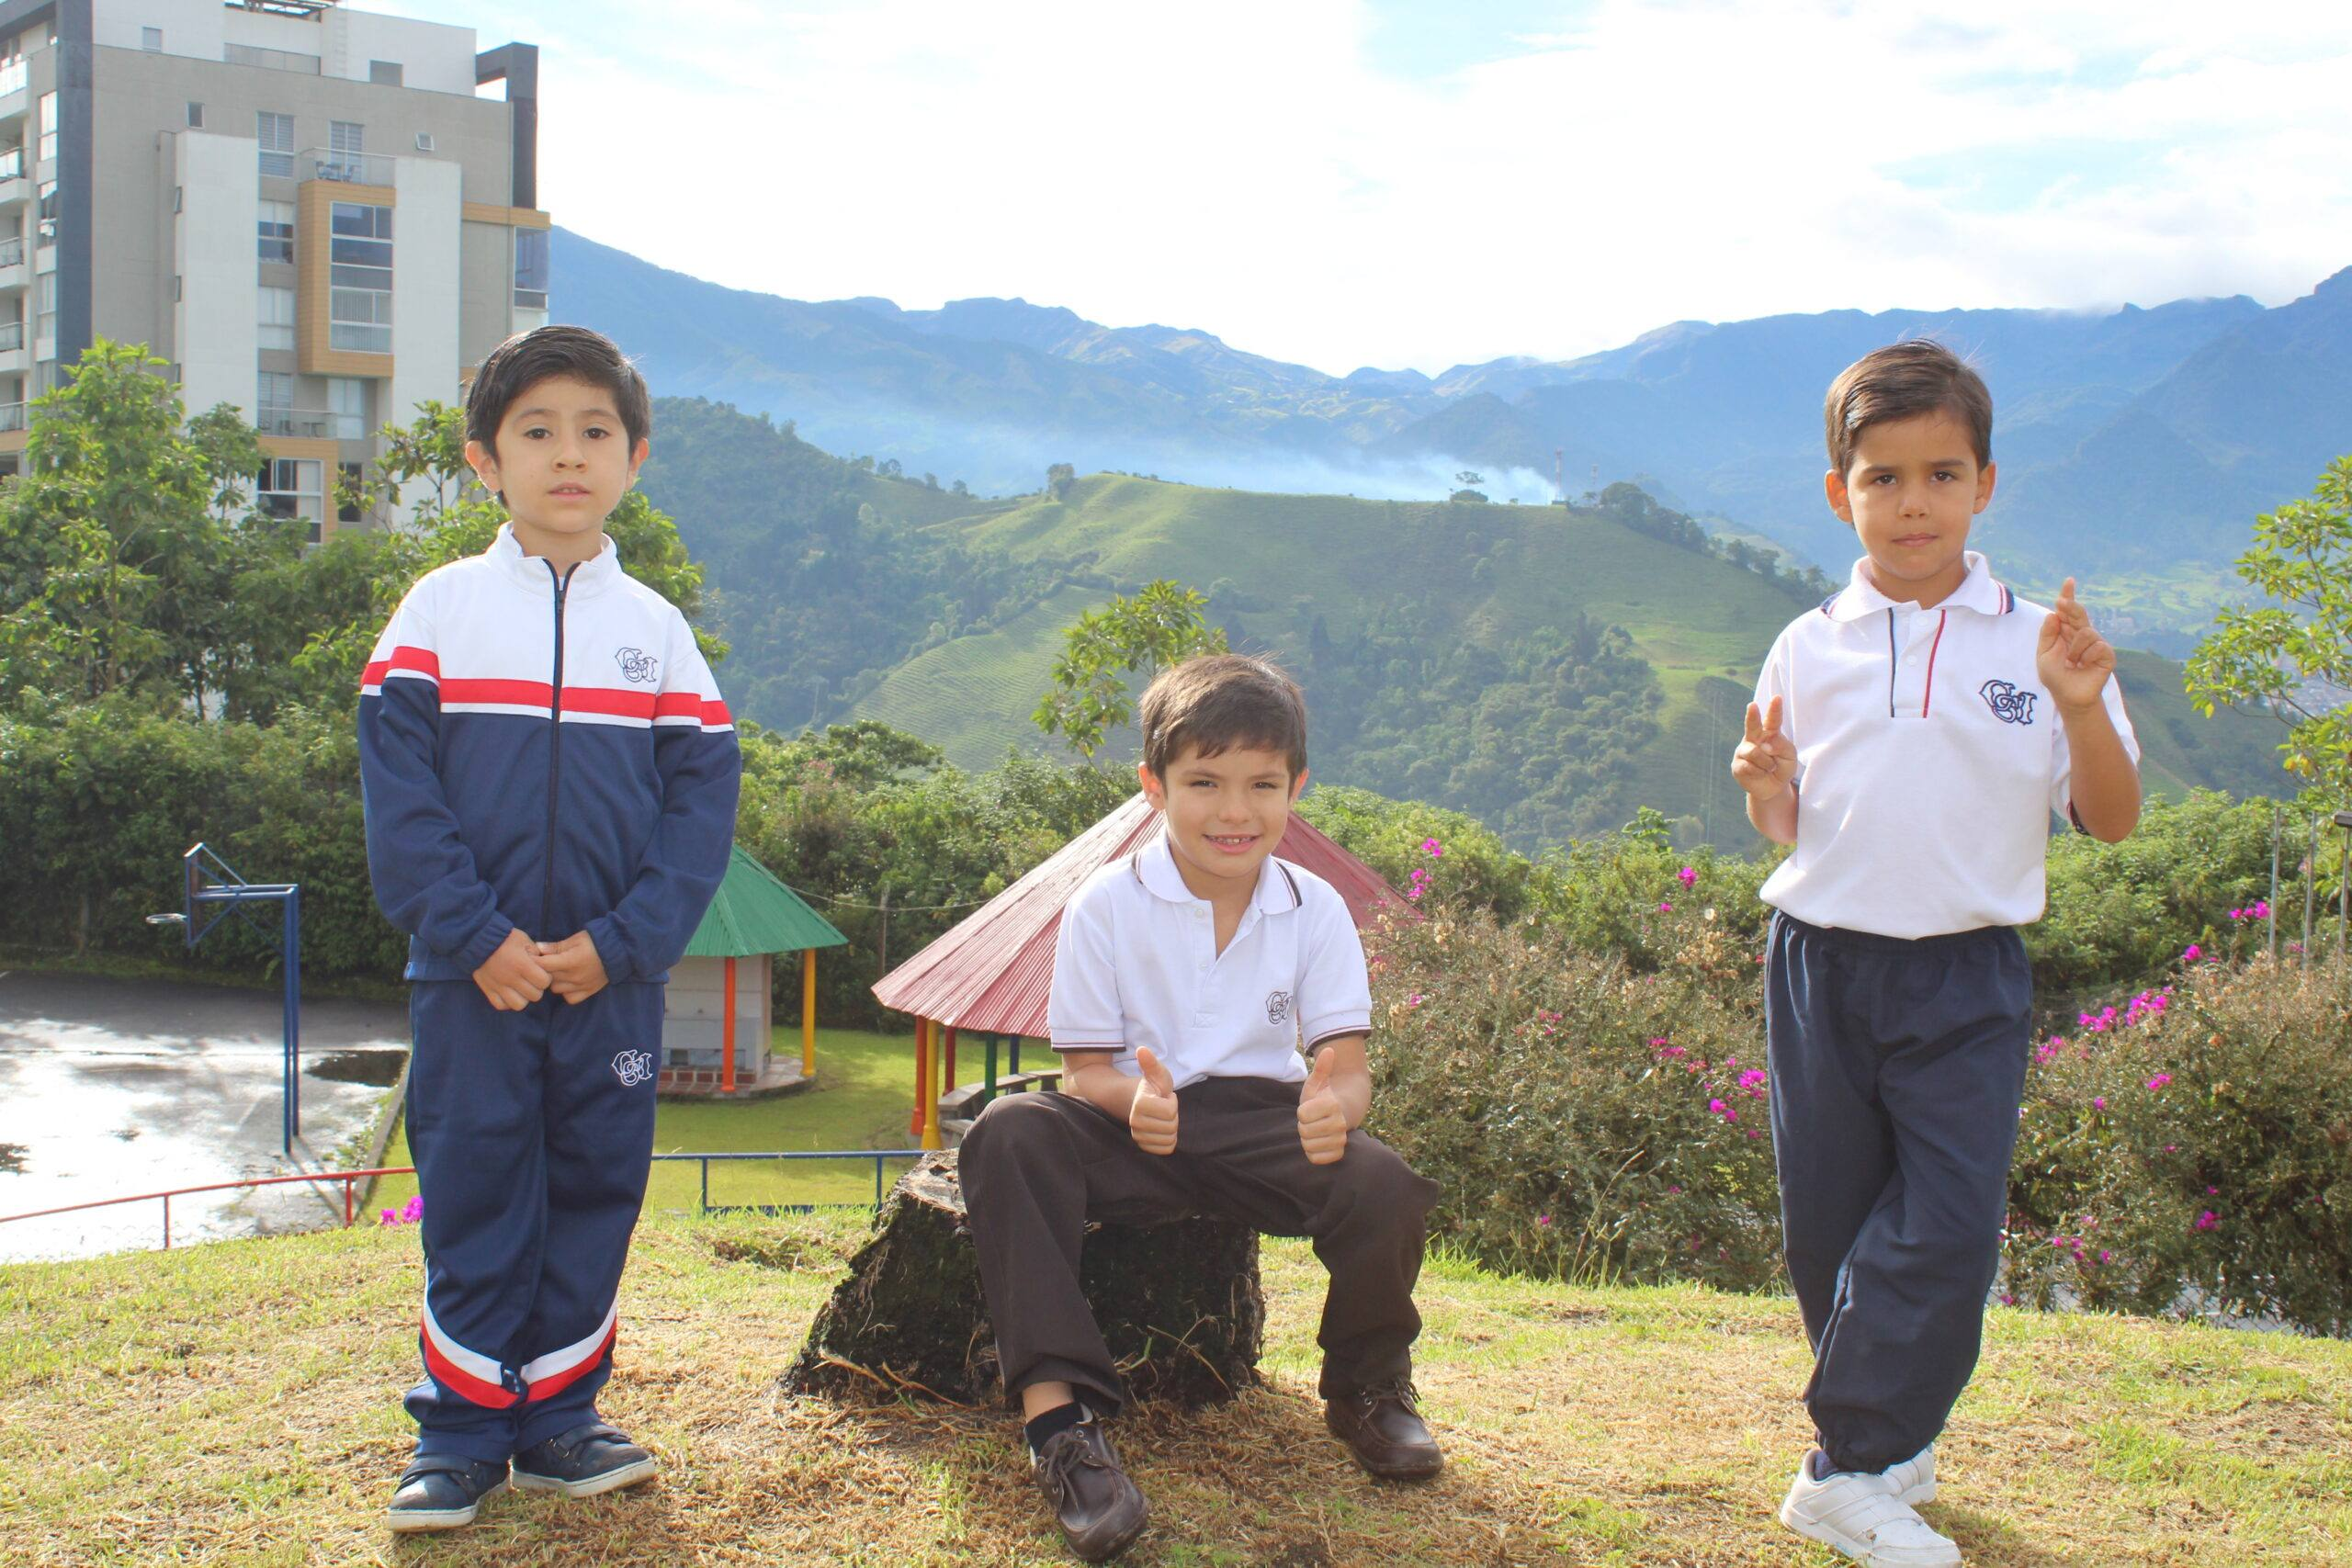 Colegio Santa Inés Manizales